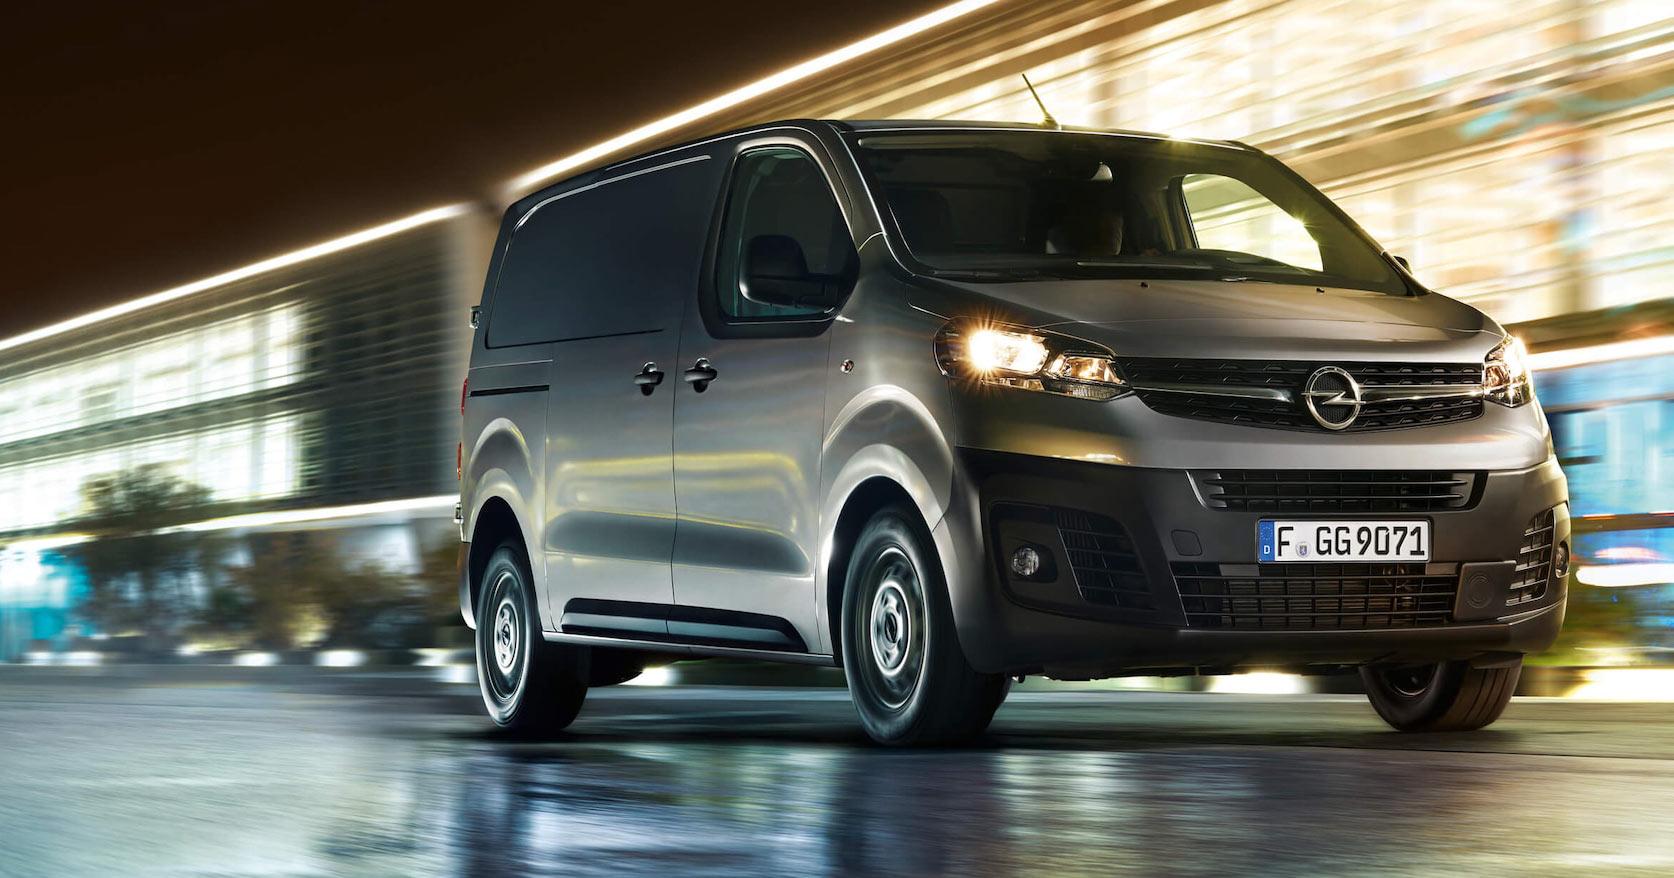 Nowy Opel Vivaro C Ceny Dostawcze Dixi Car